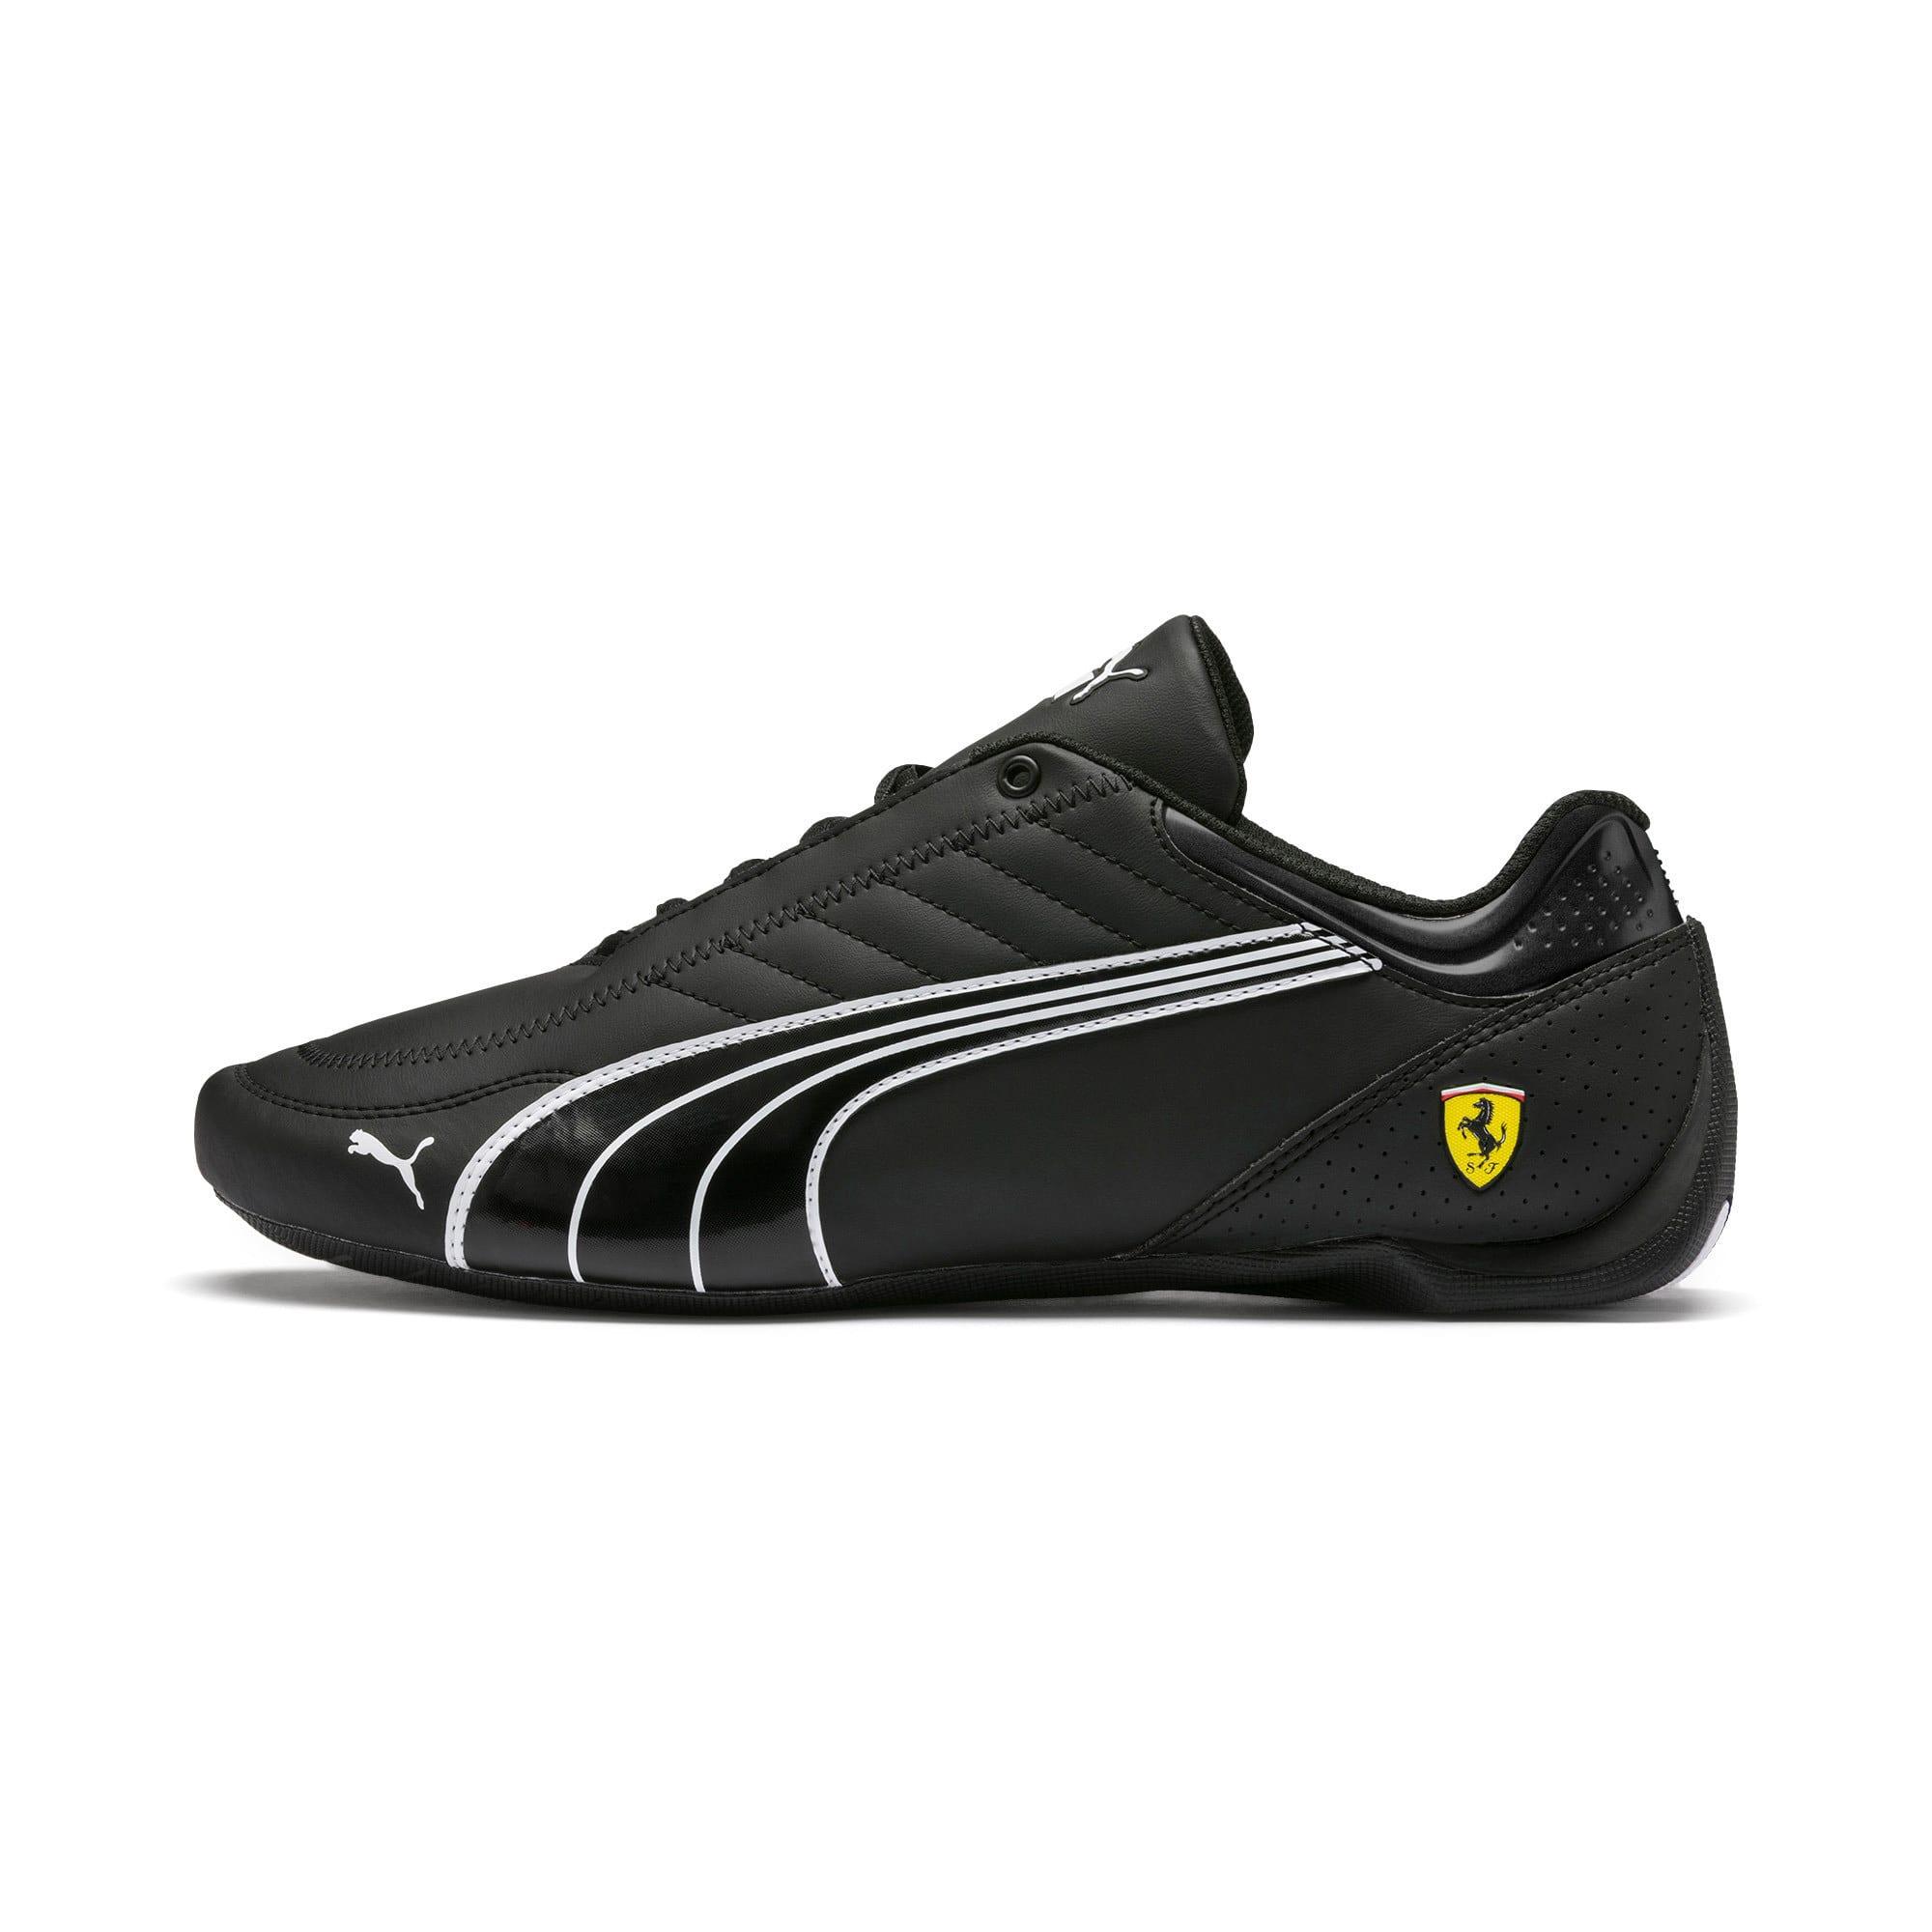 Thumbnail 1 of Scuderia Ferrari Future Kart Cat Shoes, Black-Puma White-Rosso Corsa, medium